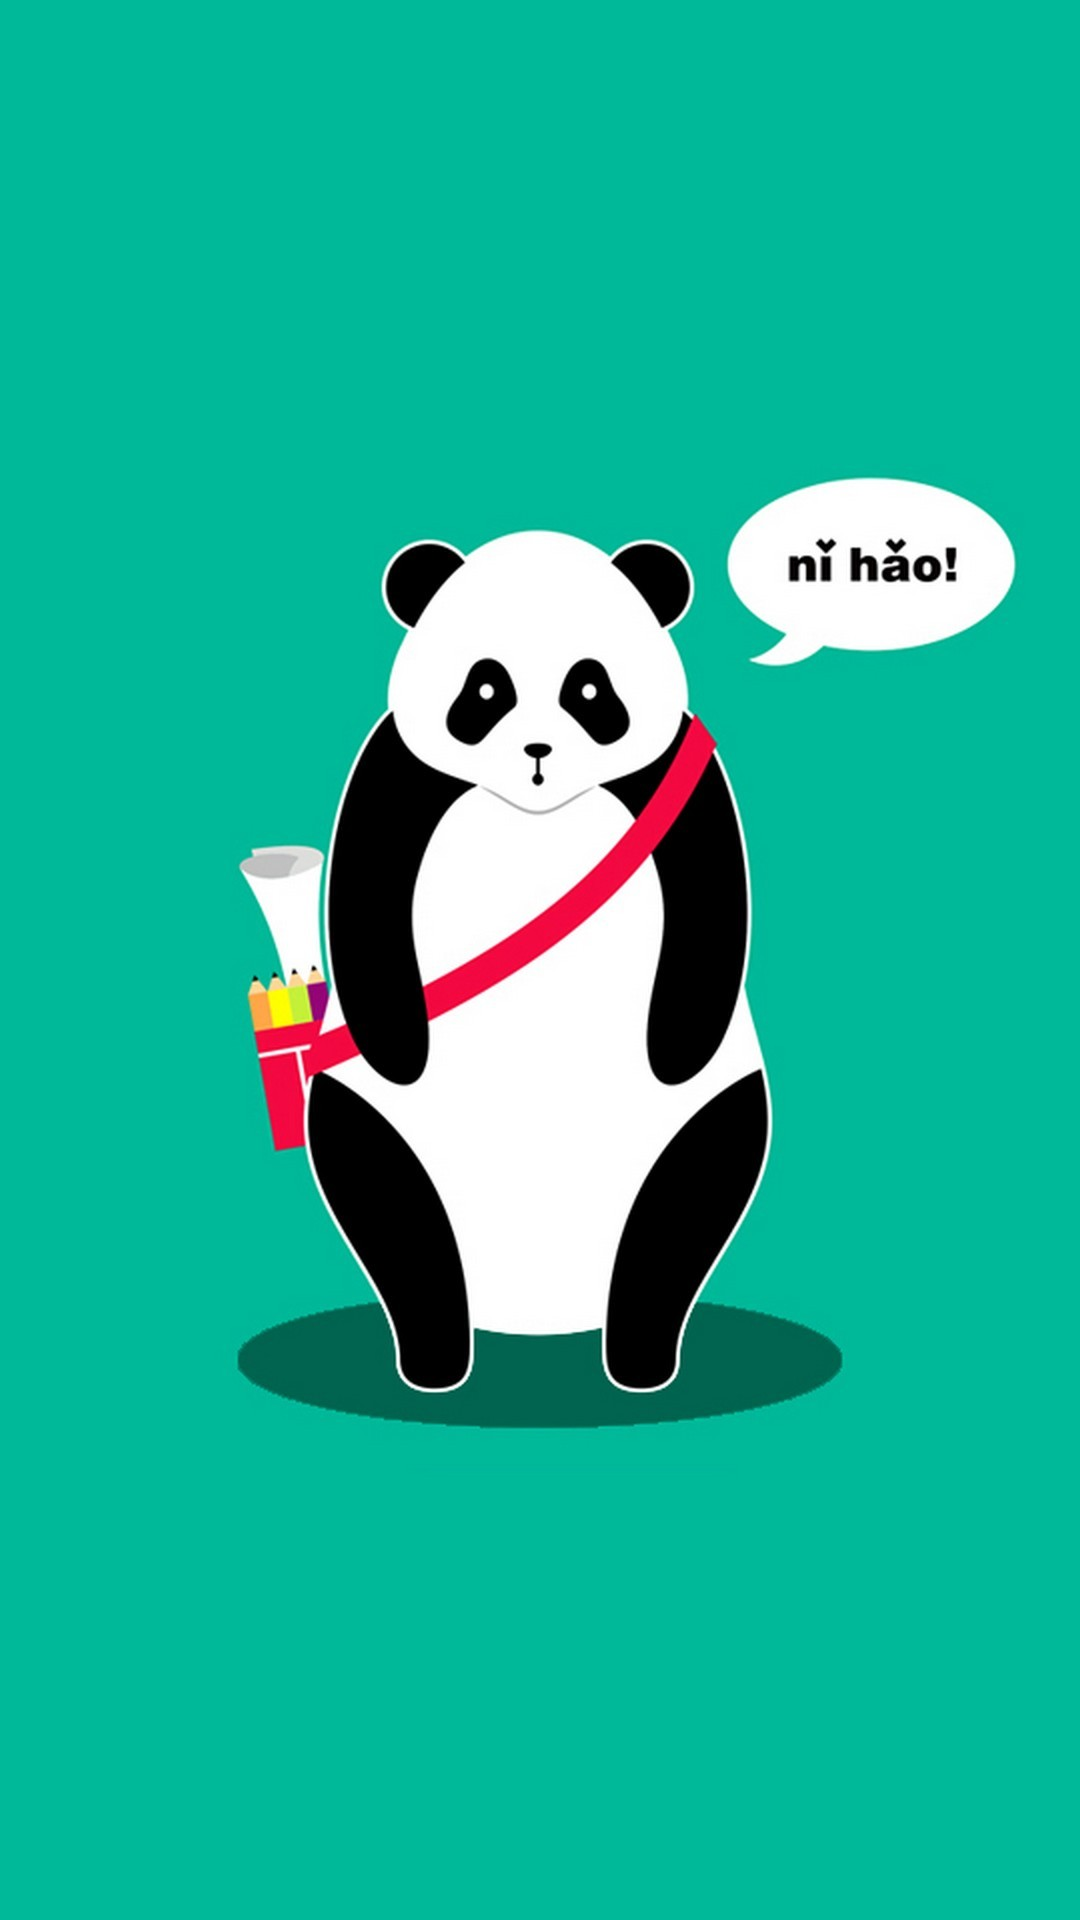 Res: 1080x1920, iPhone Wallpaper Hello Panda resolution